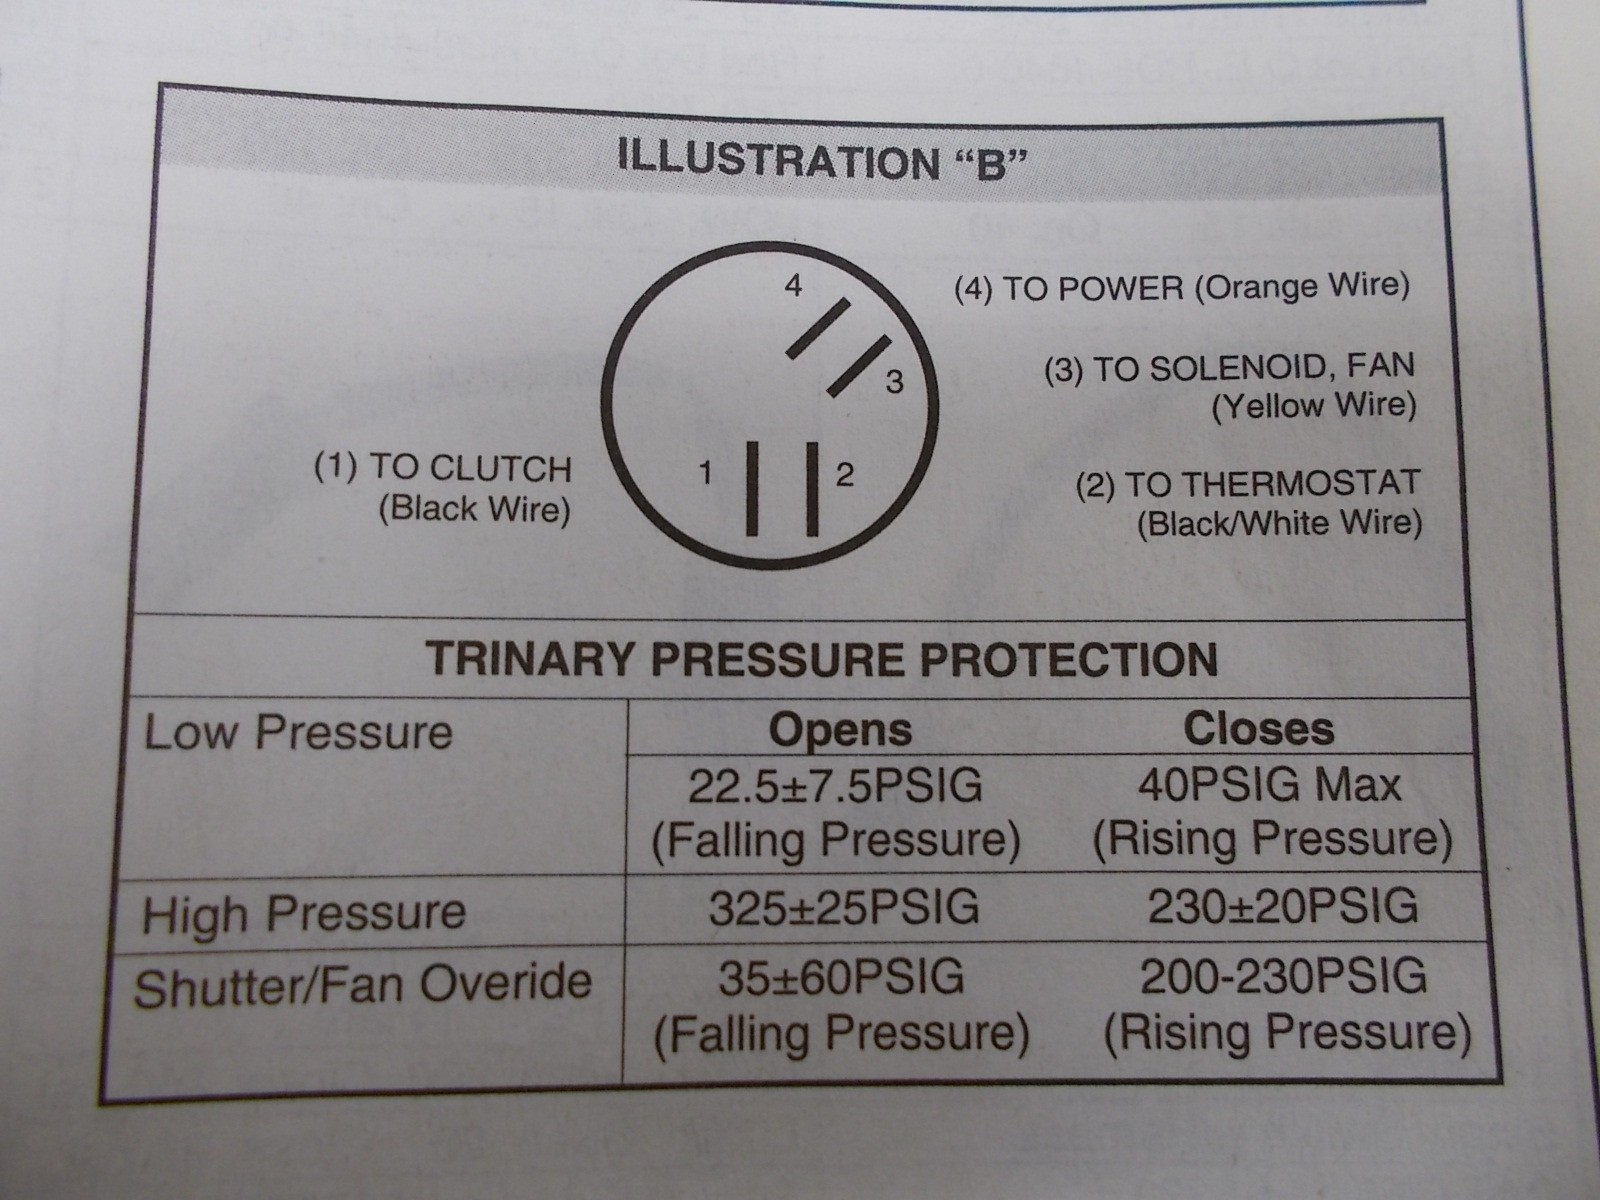 DSCN0409 Trinary Switch Wiring Diagram 5